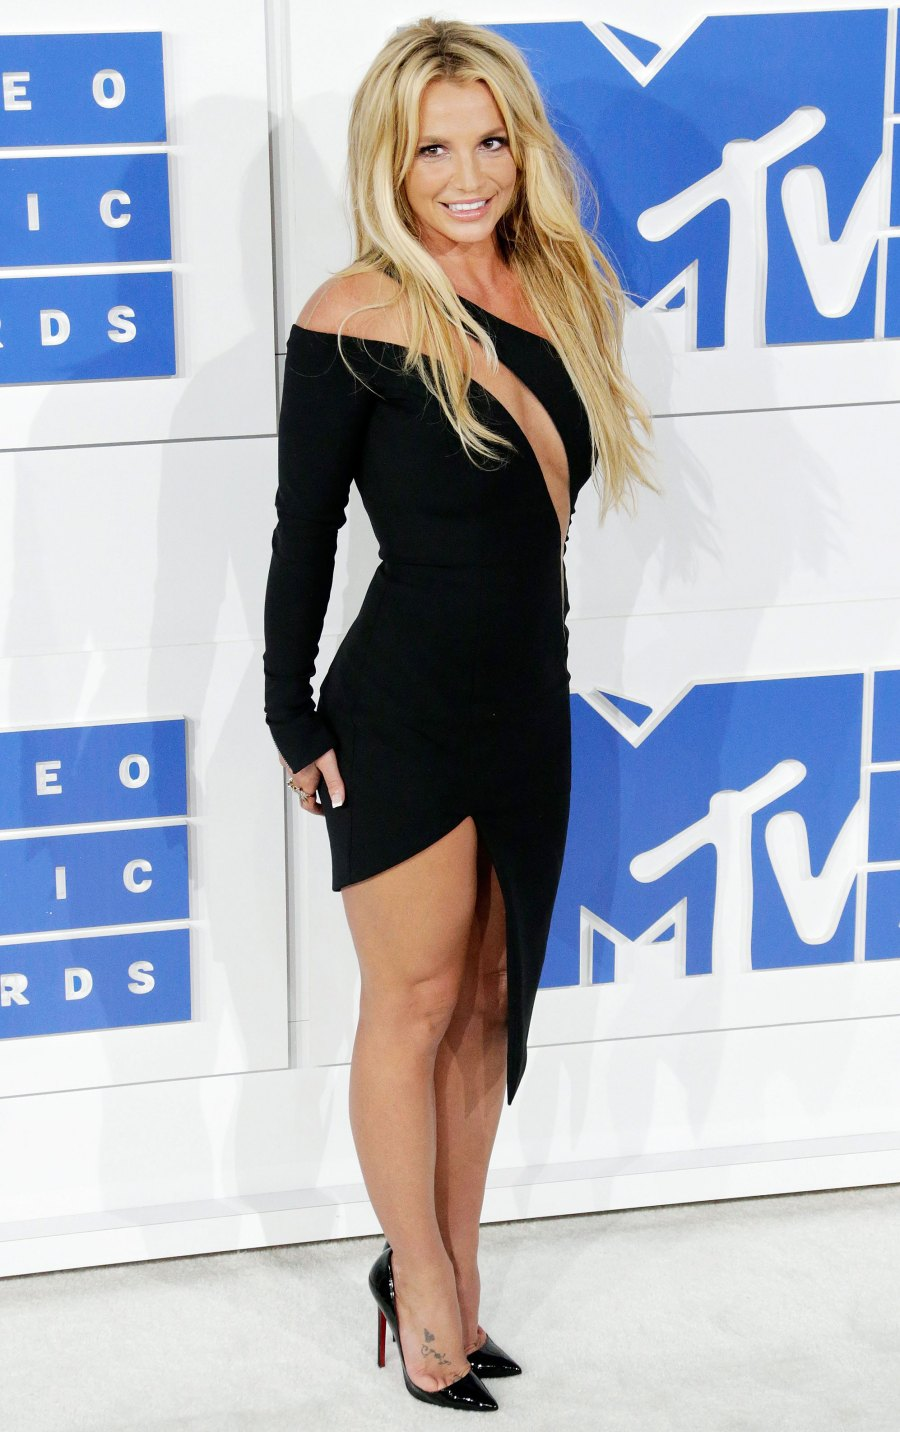 Britney-Spears-VMA-Looks-2.jpg?w=900&qua